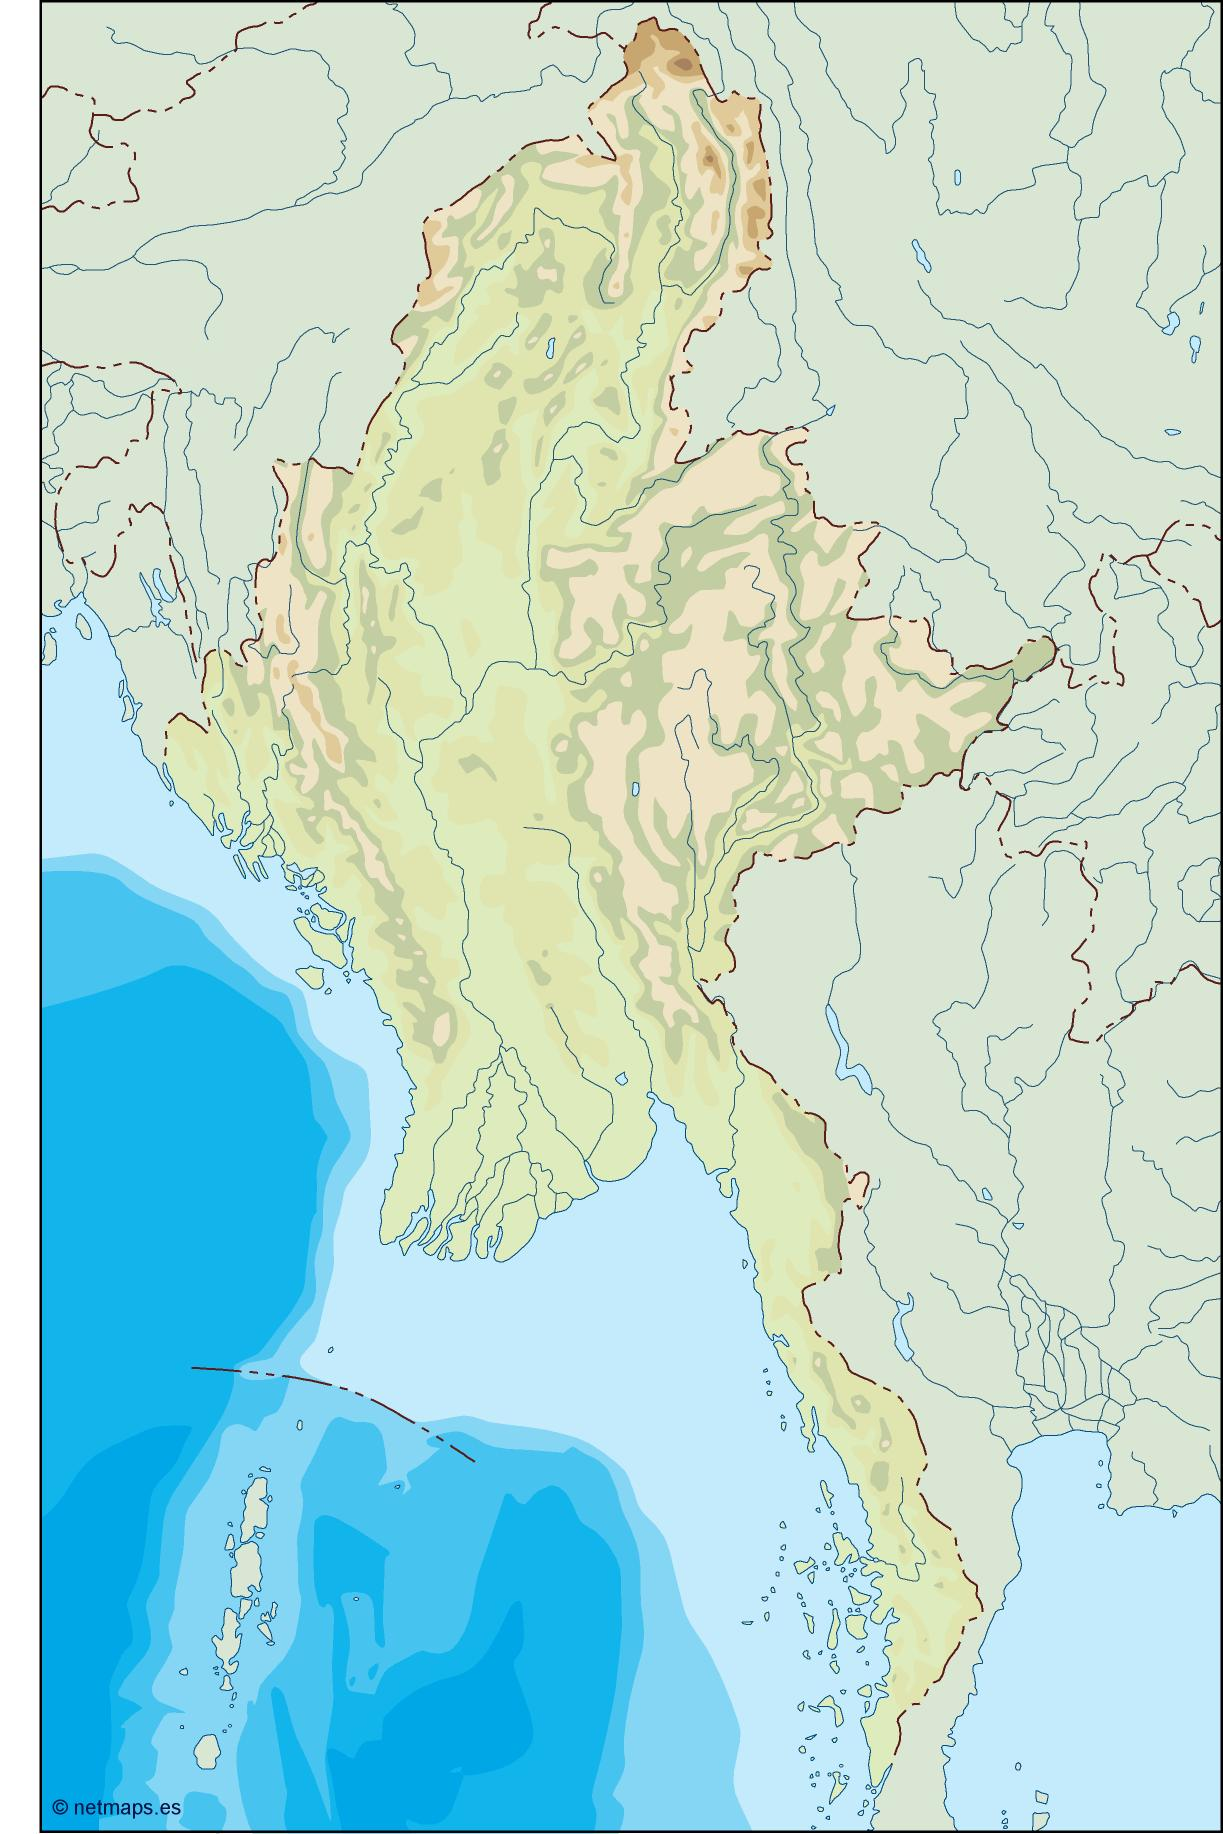 burma illustrator map